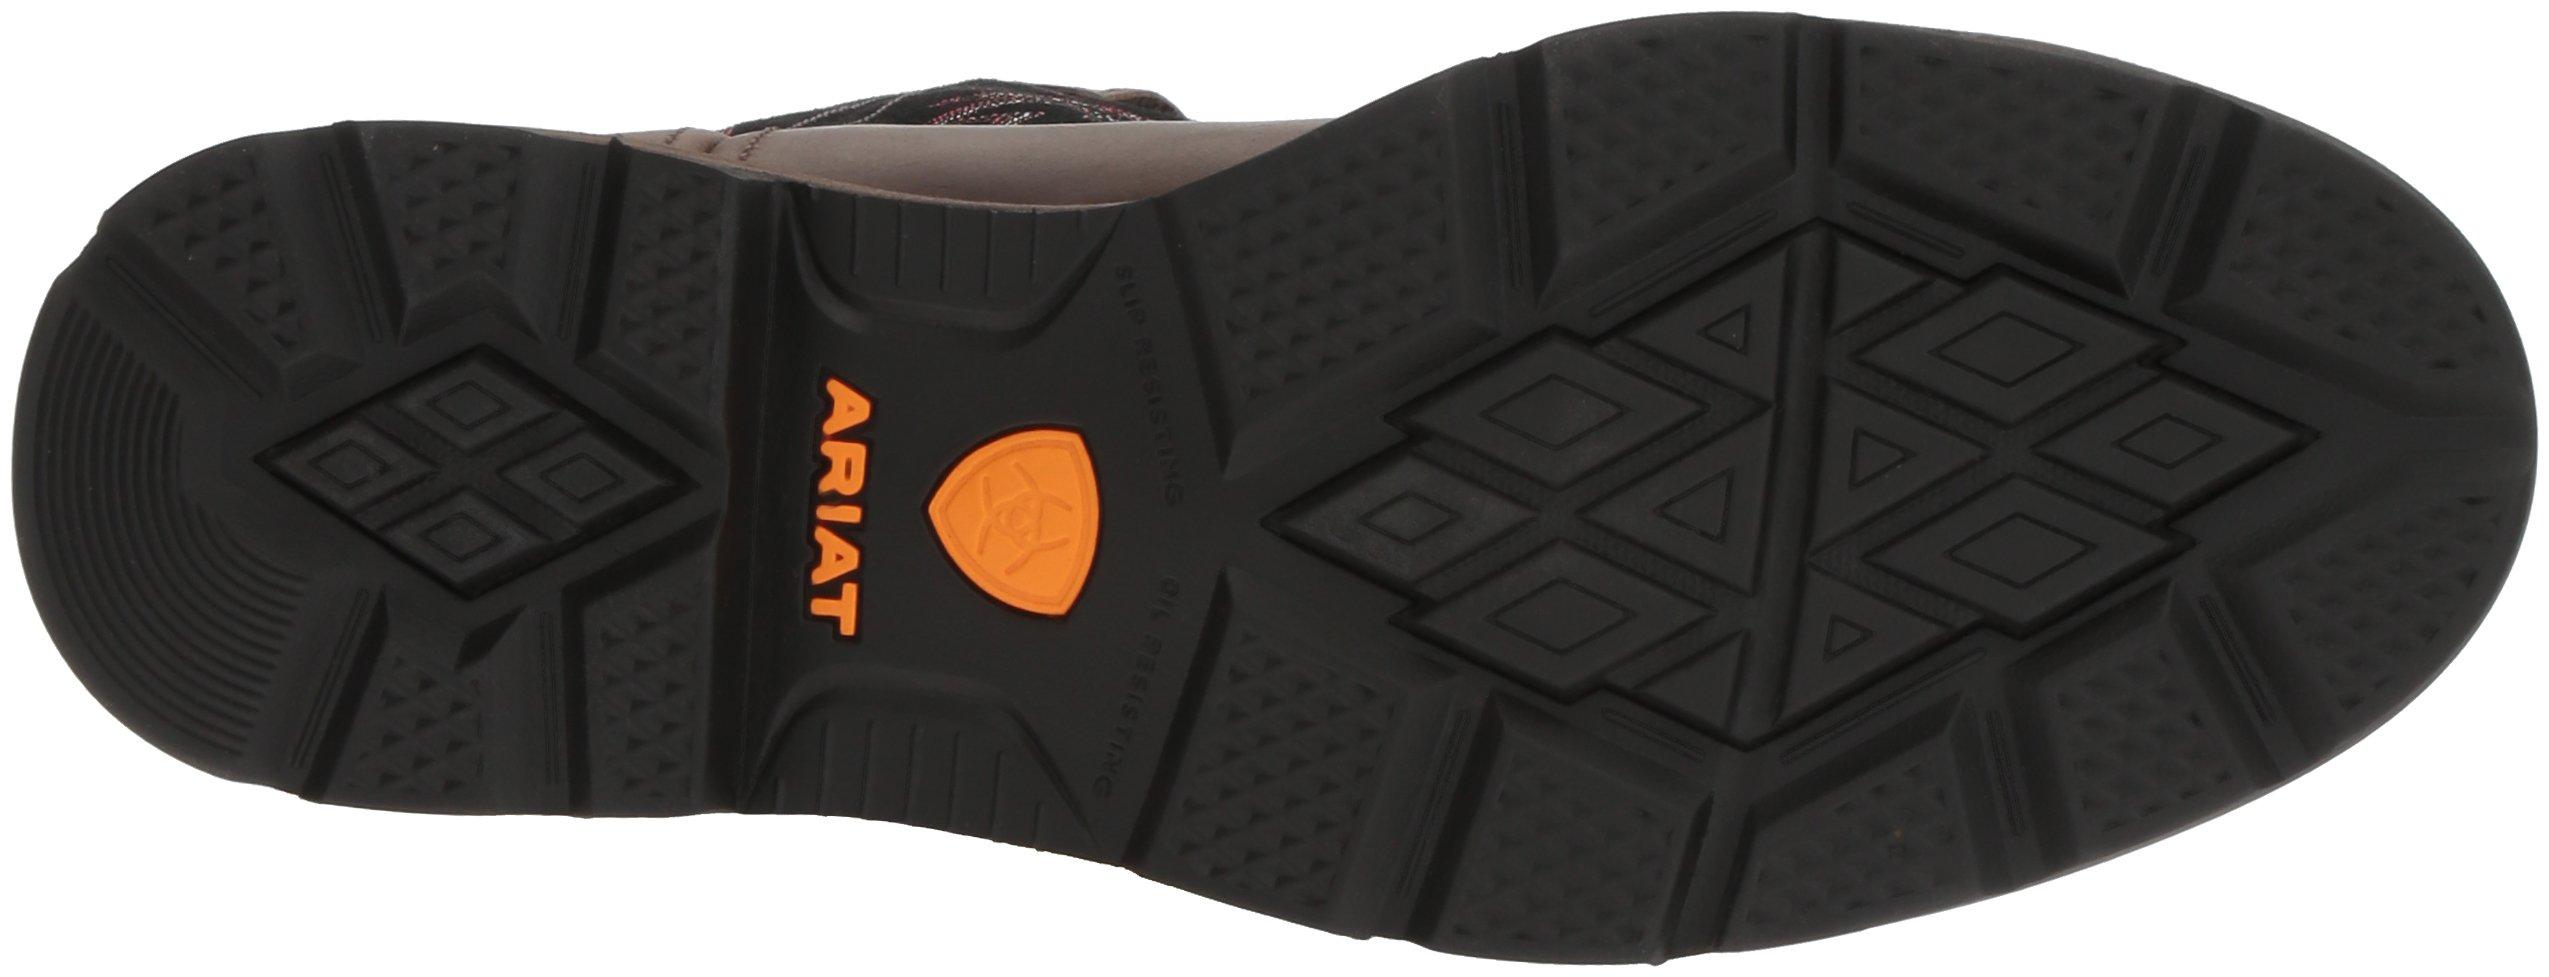 Ariat Work Men's Groundbreaker Pull-On Steel Toe Work Boot, Brown/Black, 10 D US by Ariat (Image #3)